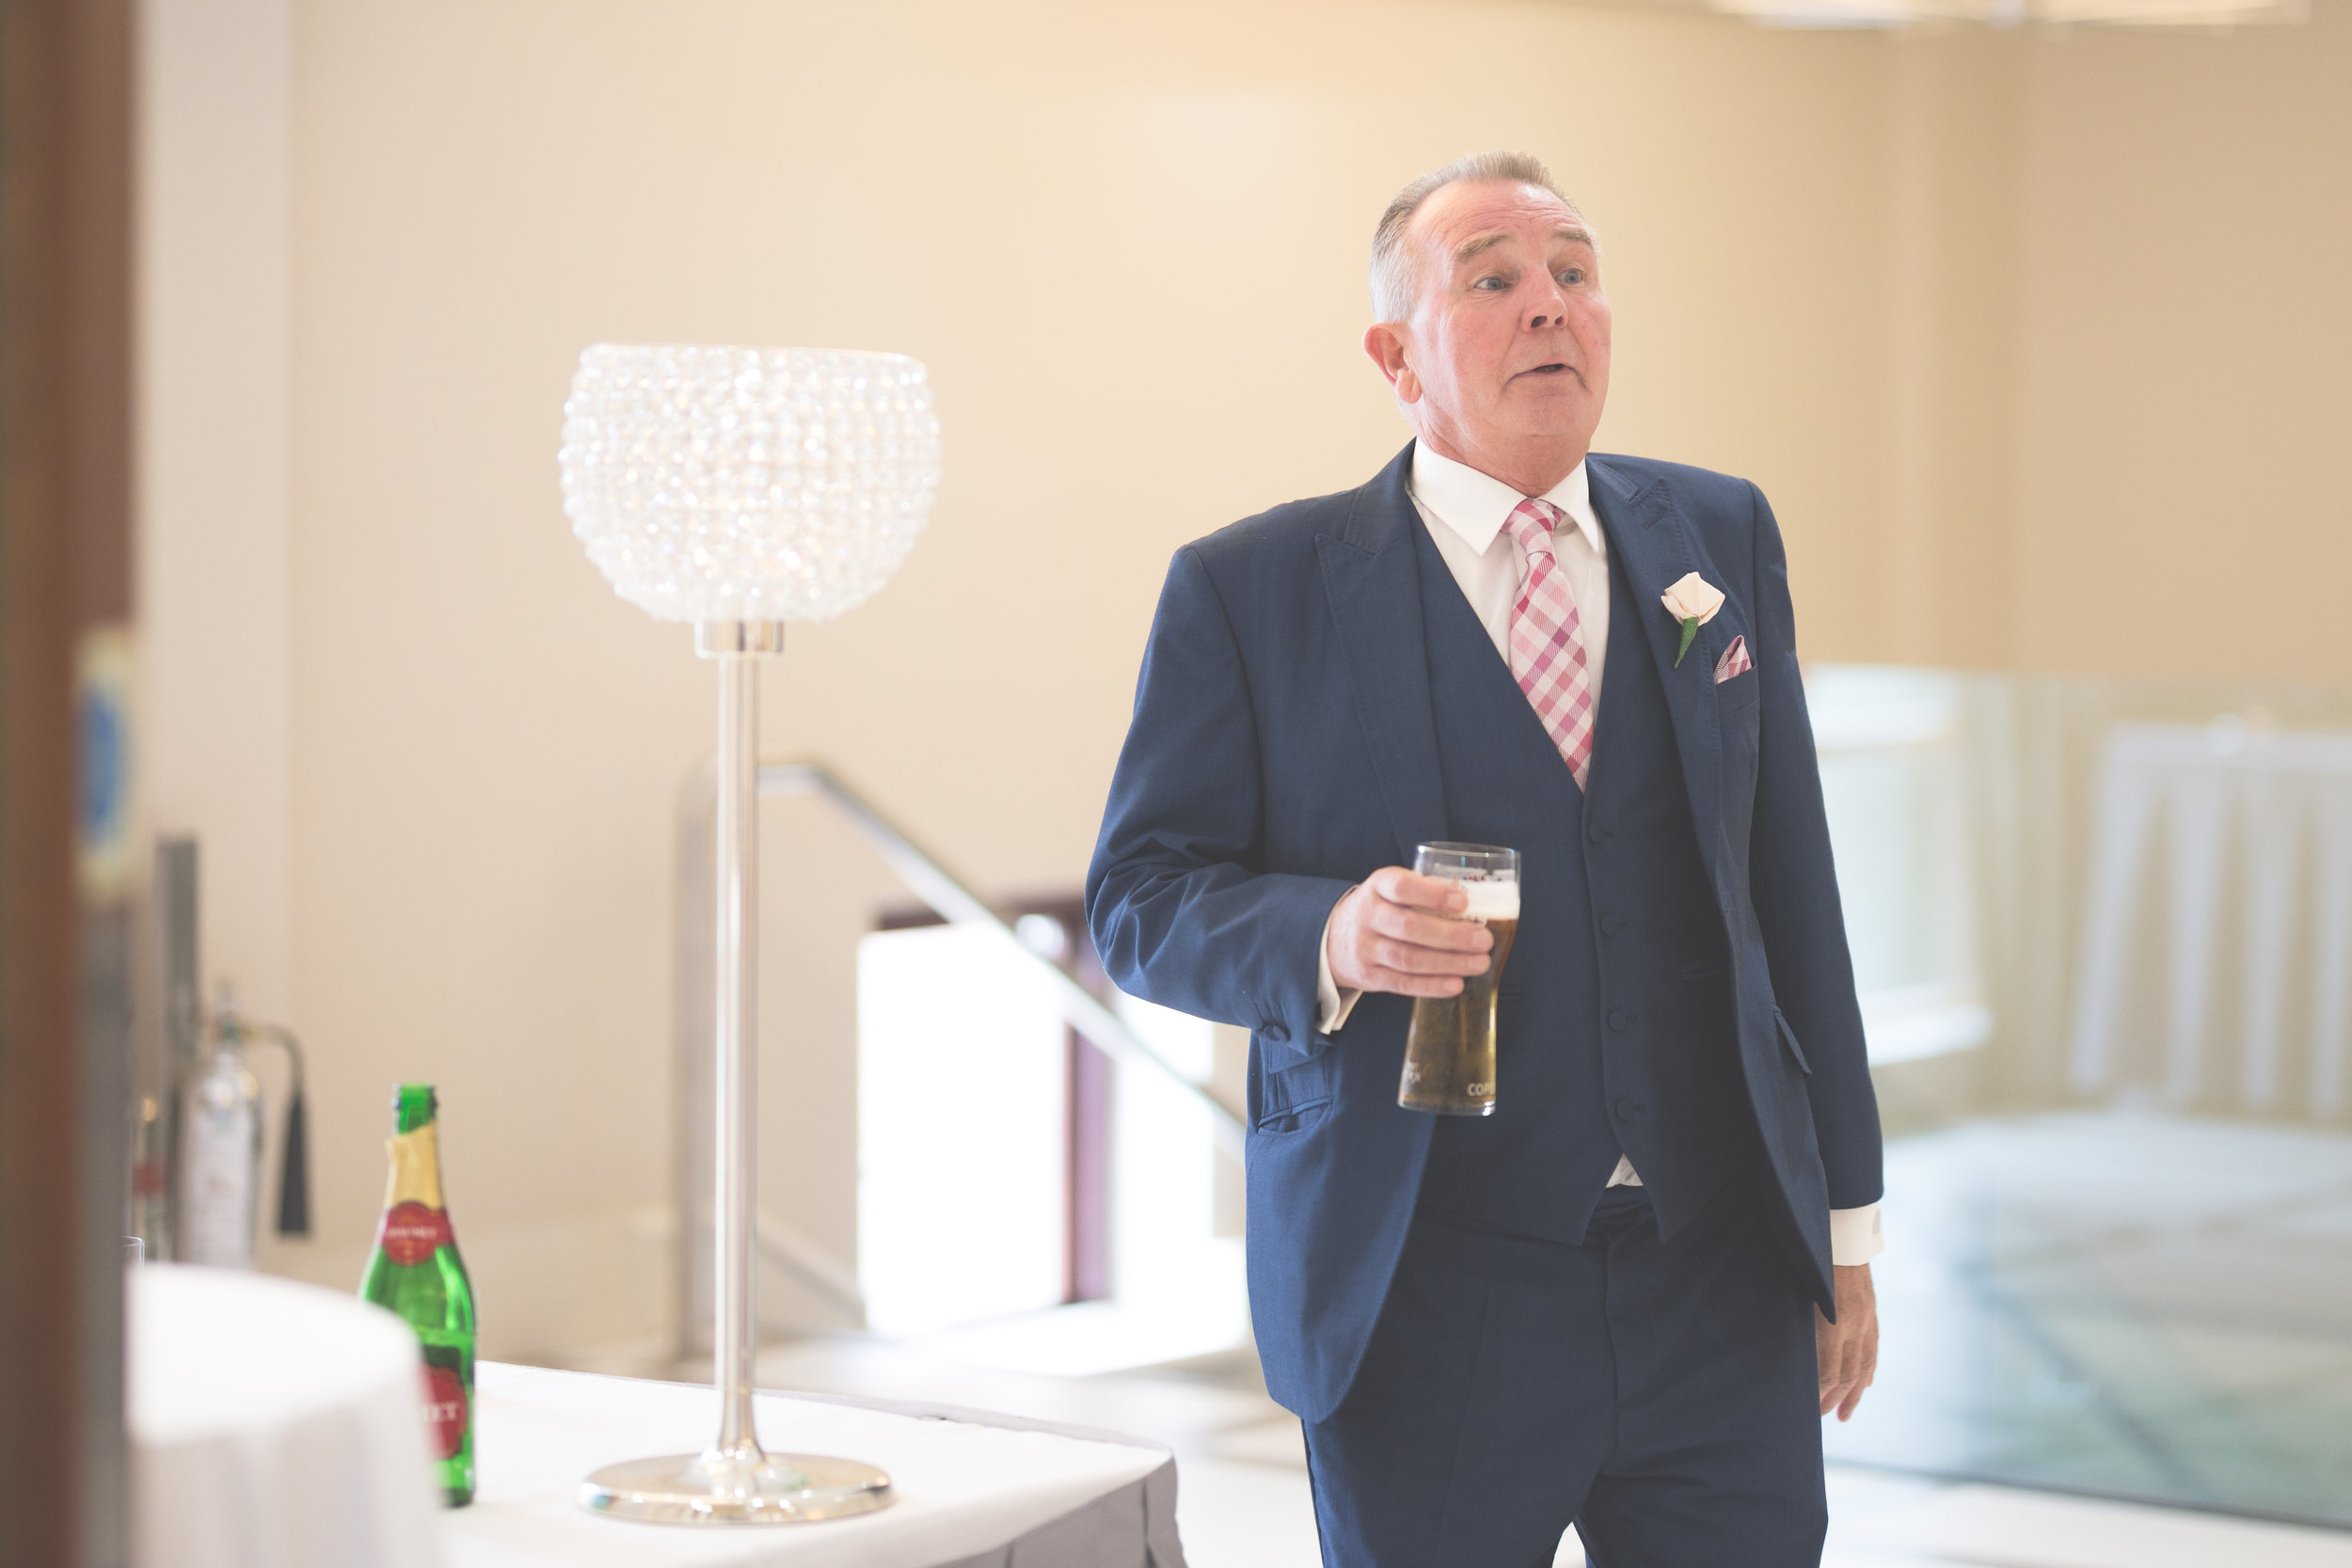 Antoinette & Stephen - Portraits | Brian McEwan Photography | Wedding Photographer Northern Ireland 102.jpg